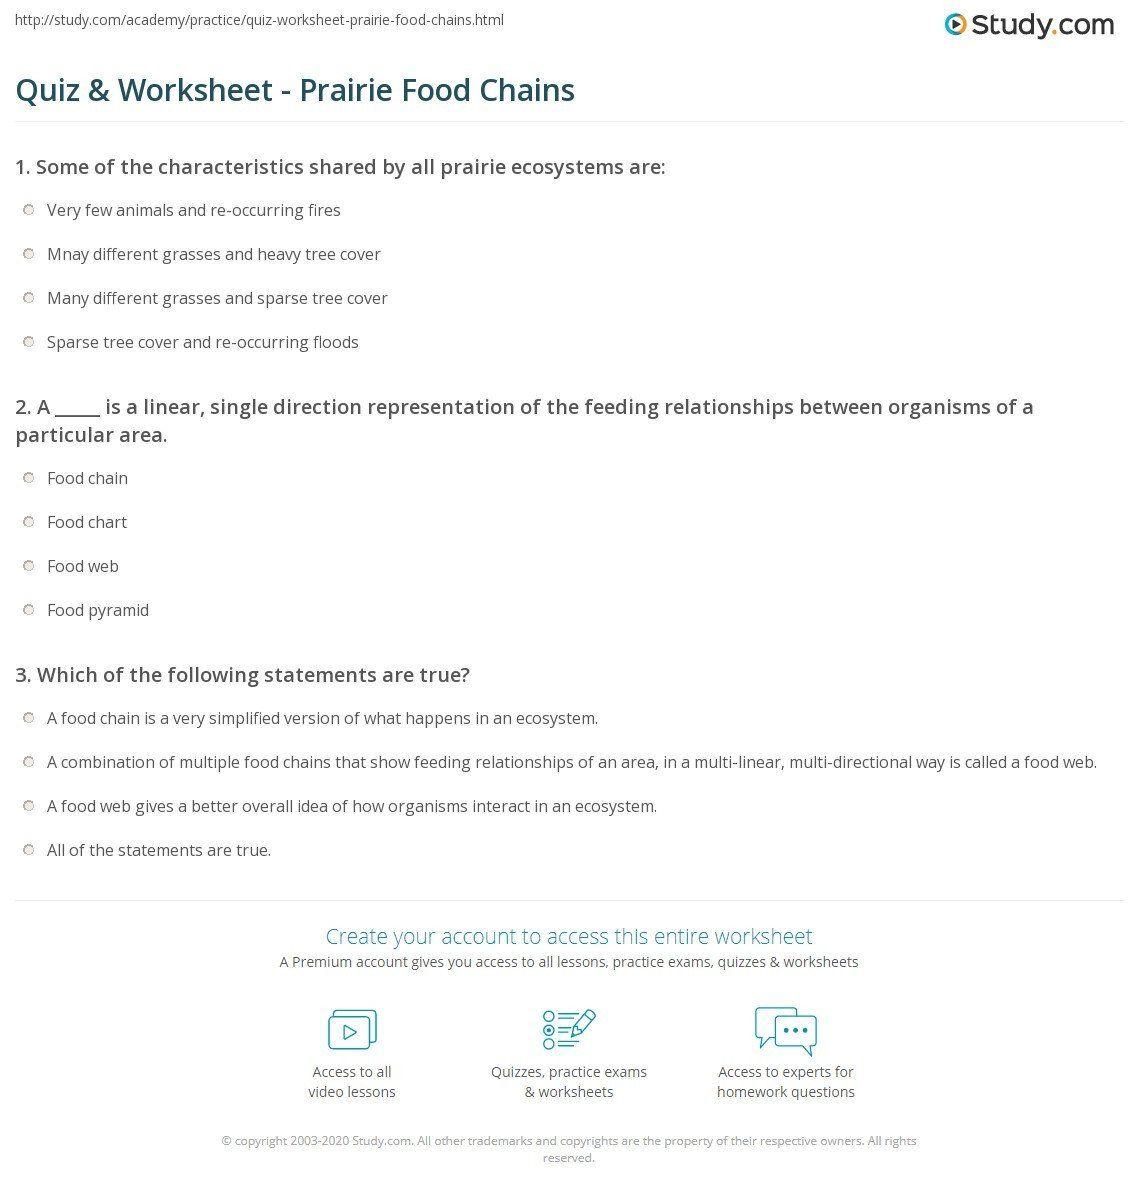 Food Web Worksheet Answers Food Chain Quiz Worksheet In 2020 Food Web Worksheet Food Web Worksheets